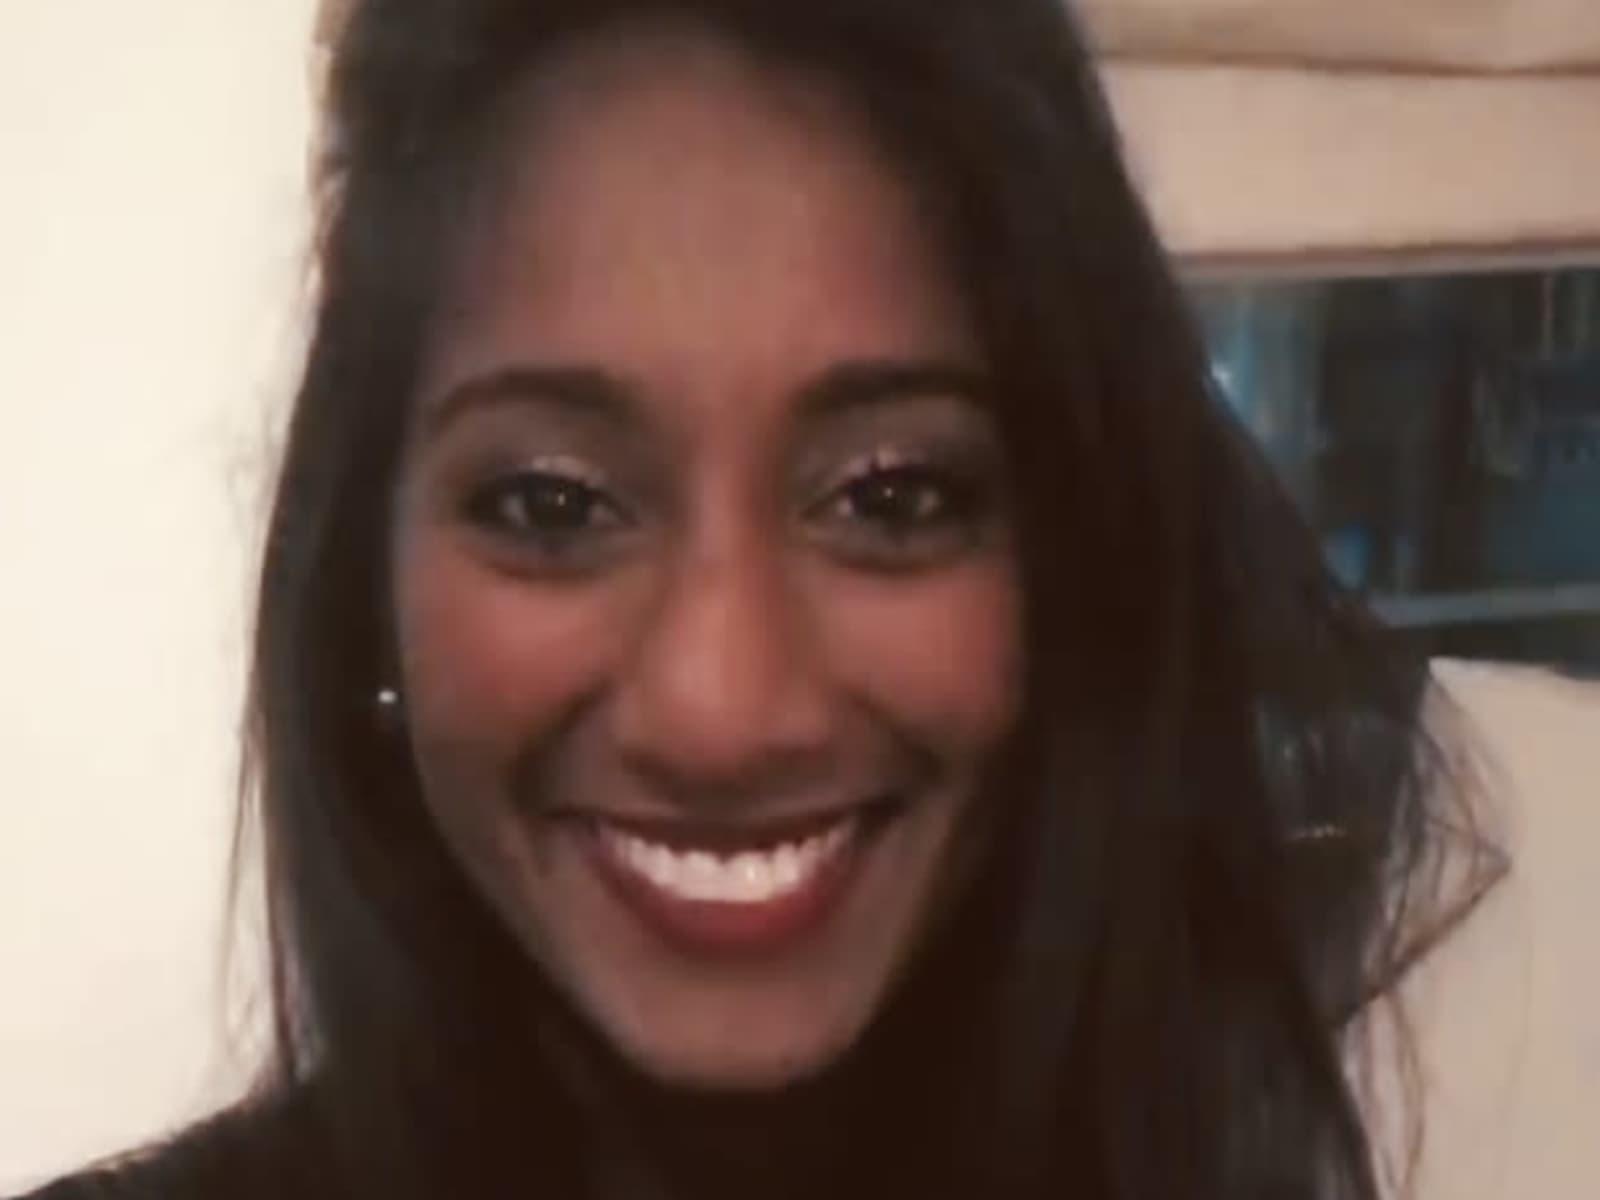 Keseena from Mahébourg, Mauritius